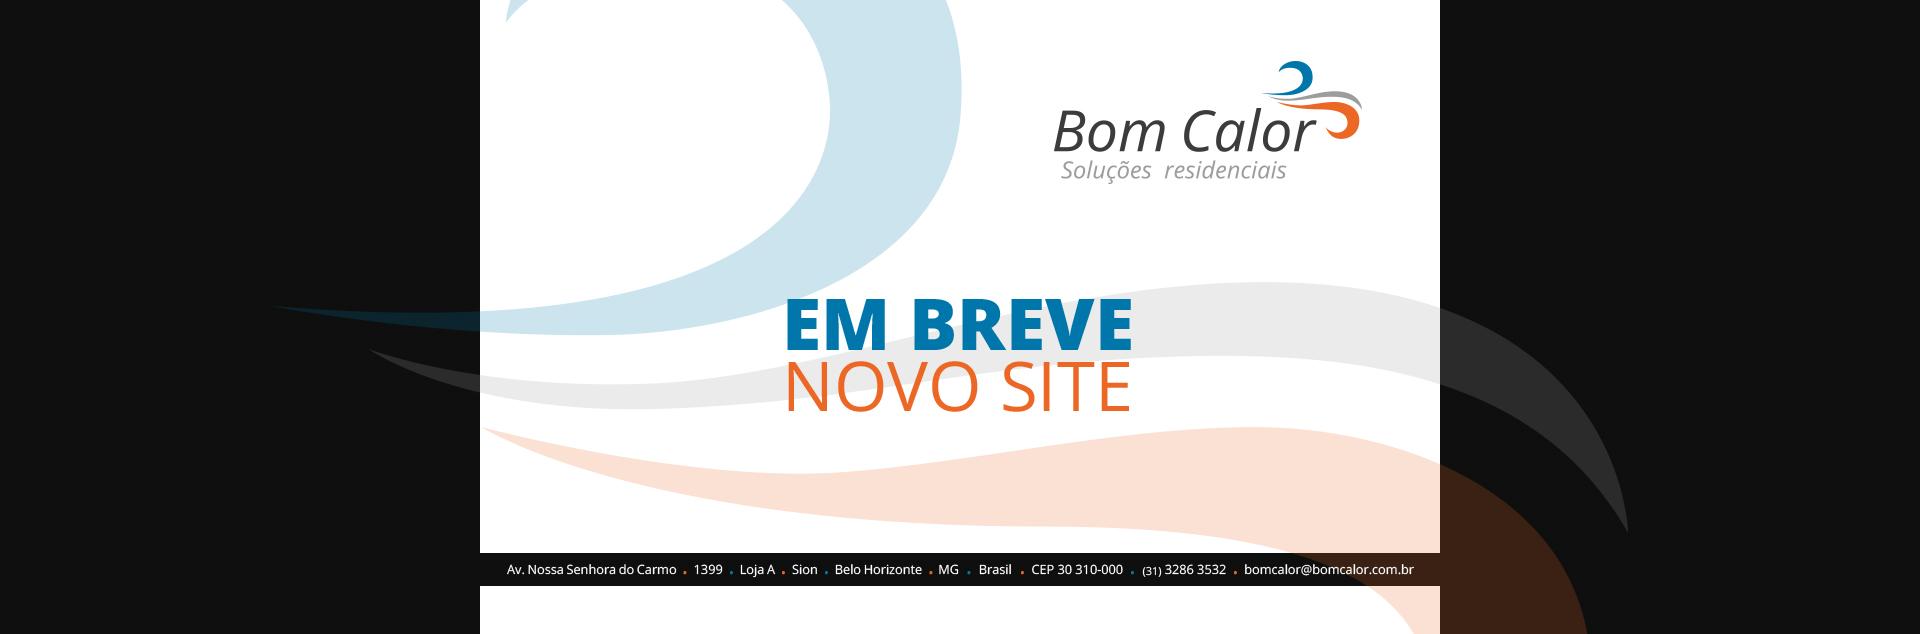 BomCalor_960_grid_16_col_tela_final